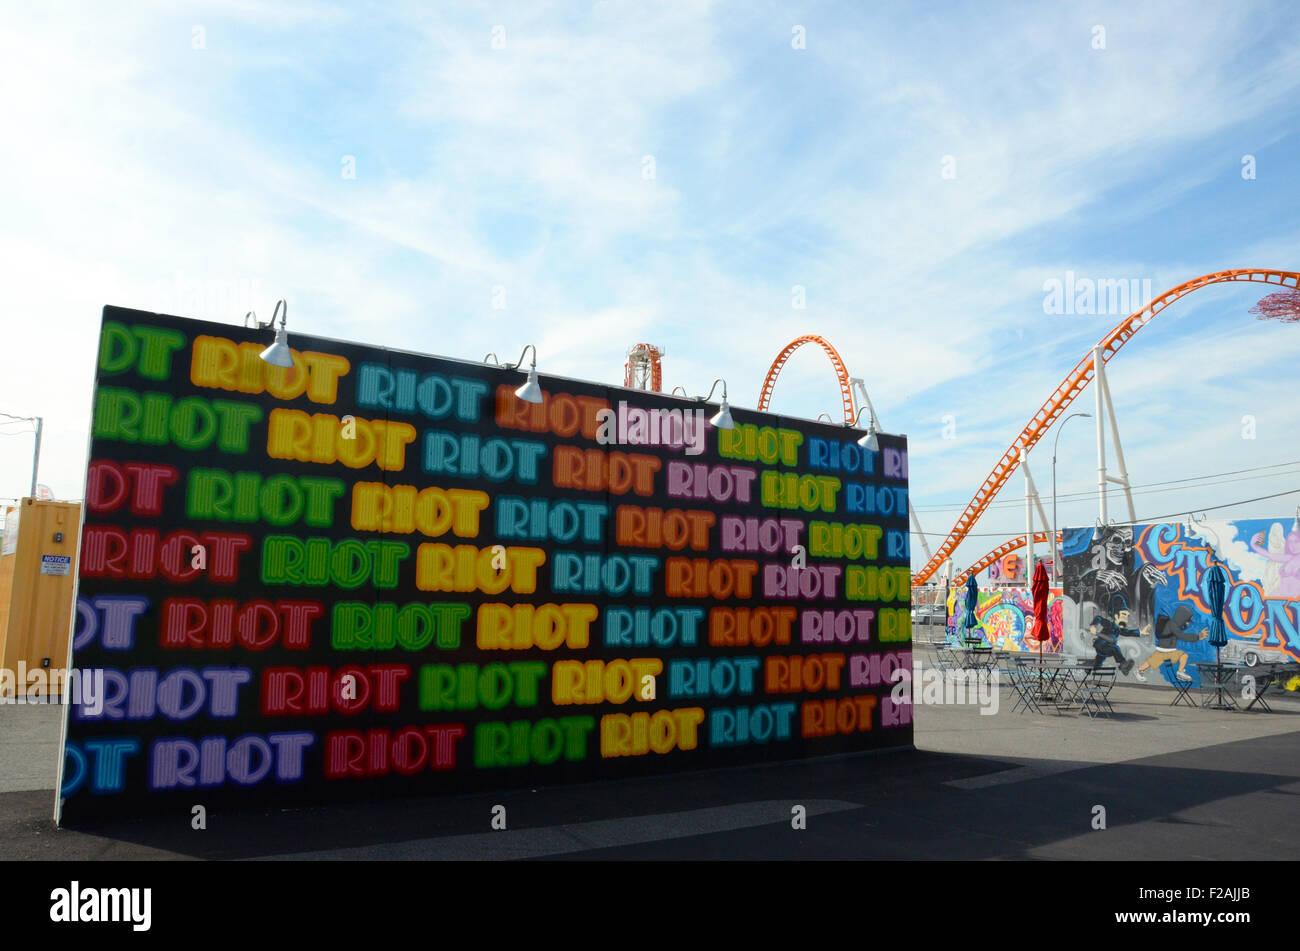 Ben Eine coney art walls coney island brooklyn - Stock Image